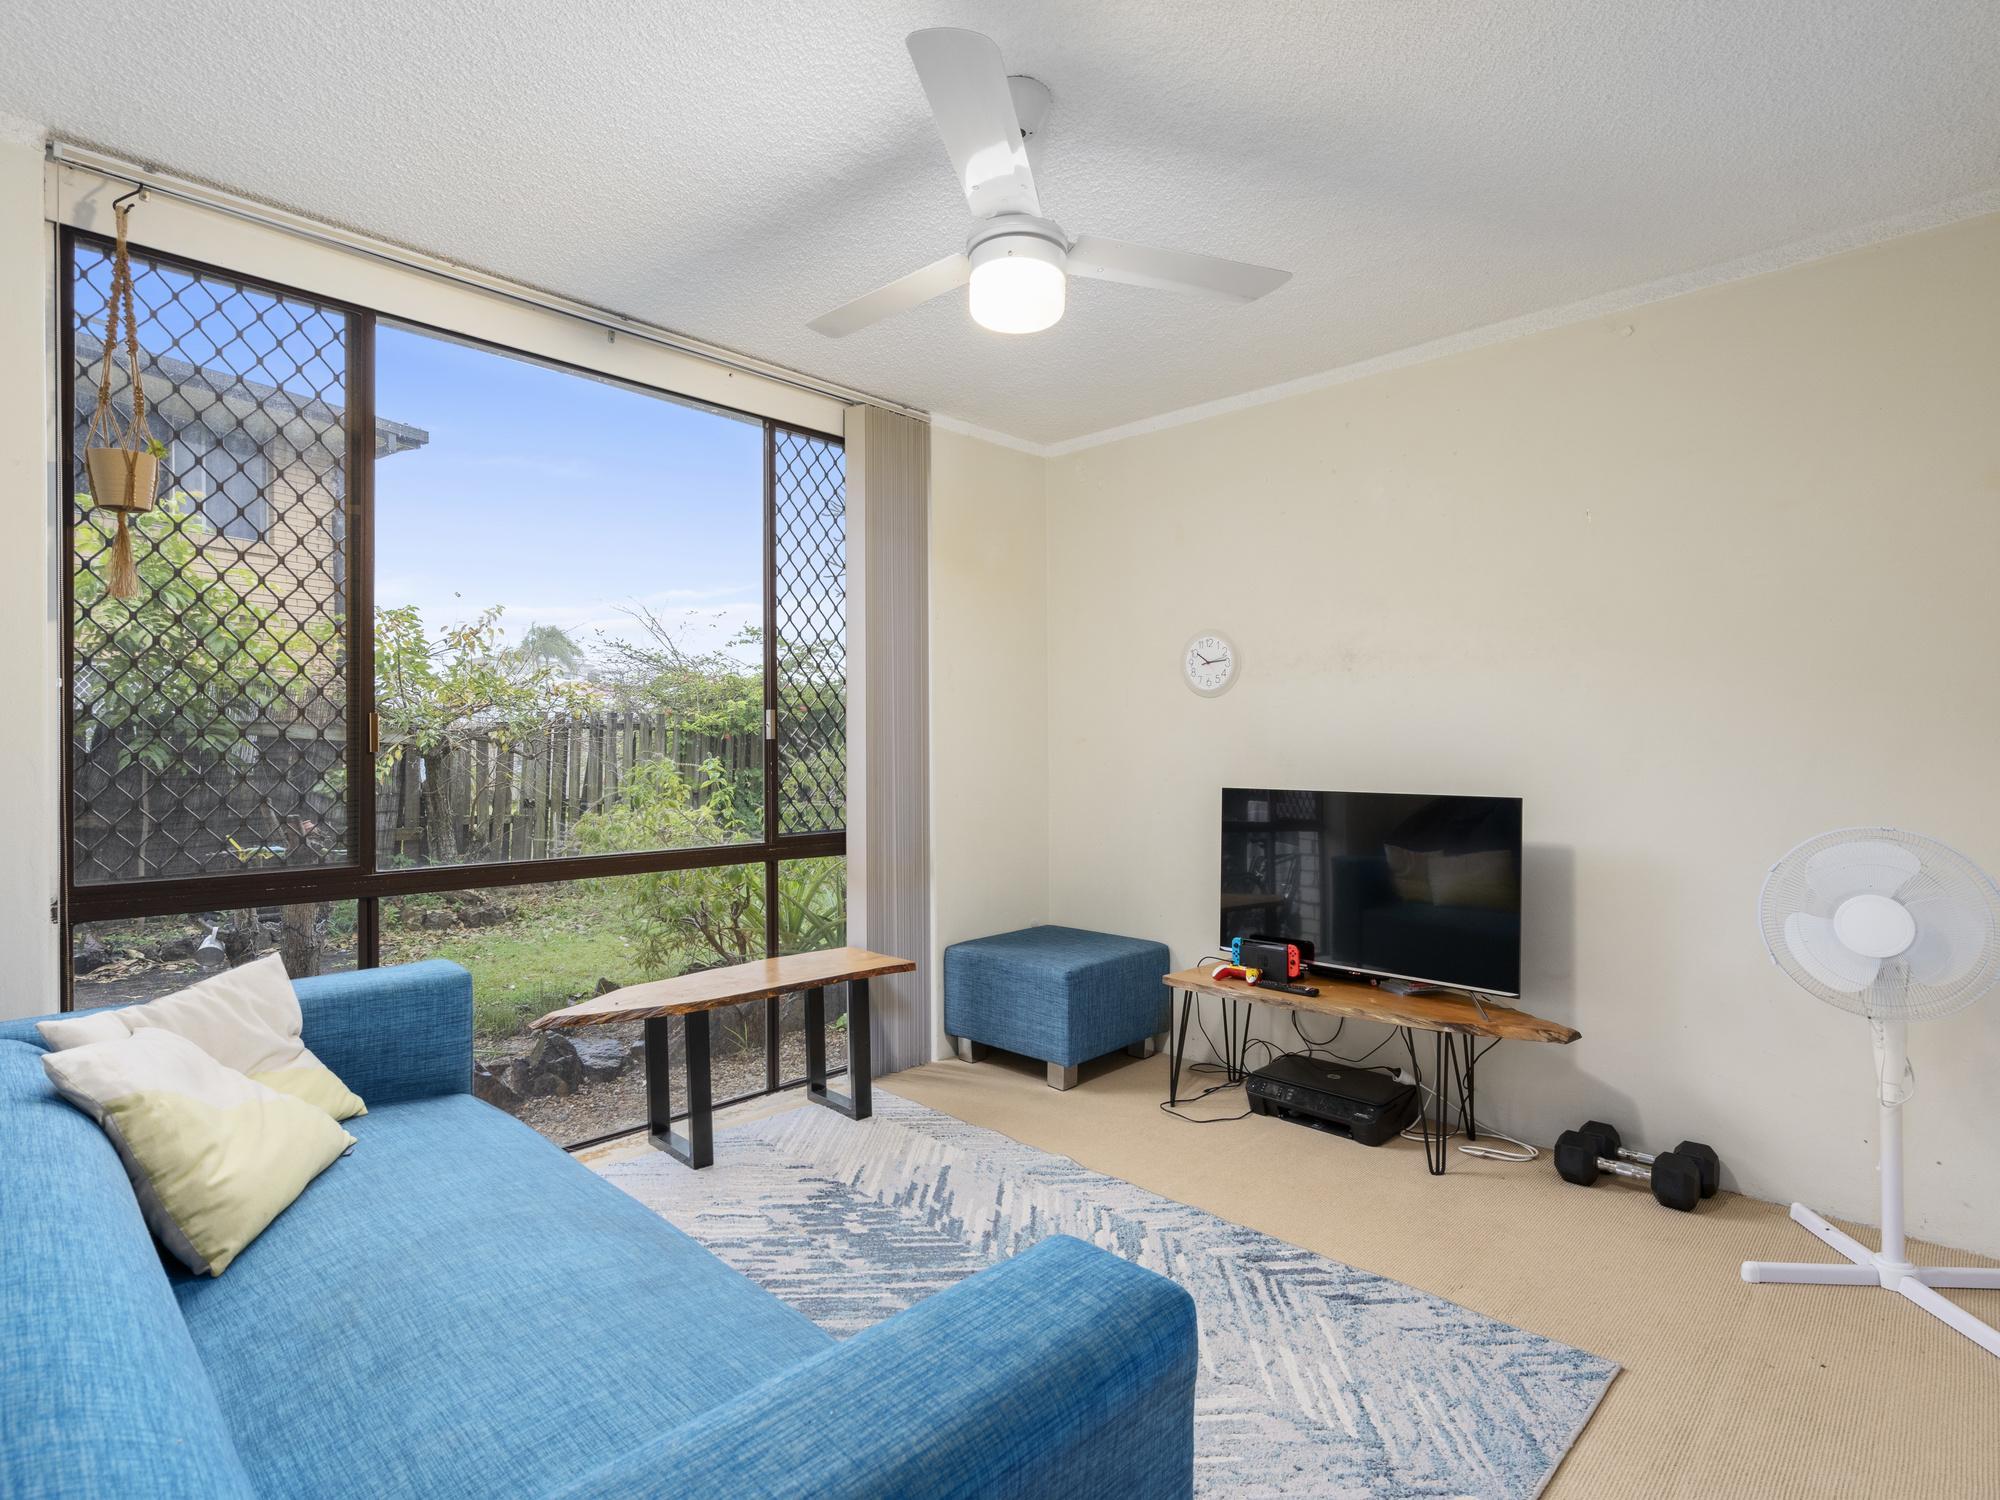 Real Estate | Gold Coast | Chevron Realty | 007 Open2view Id698602 2 33 Darrambal Street